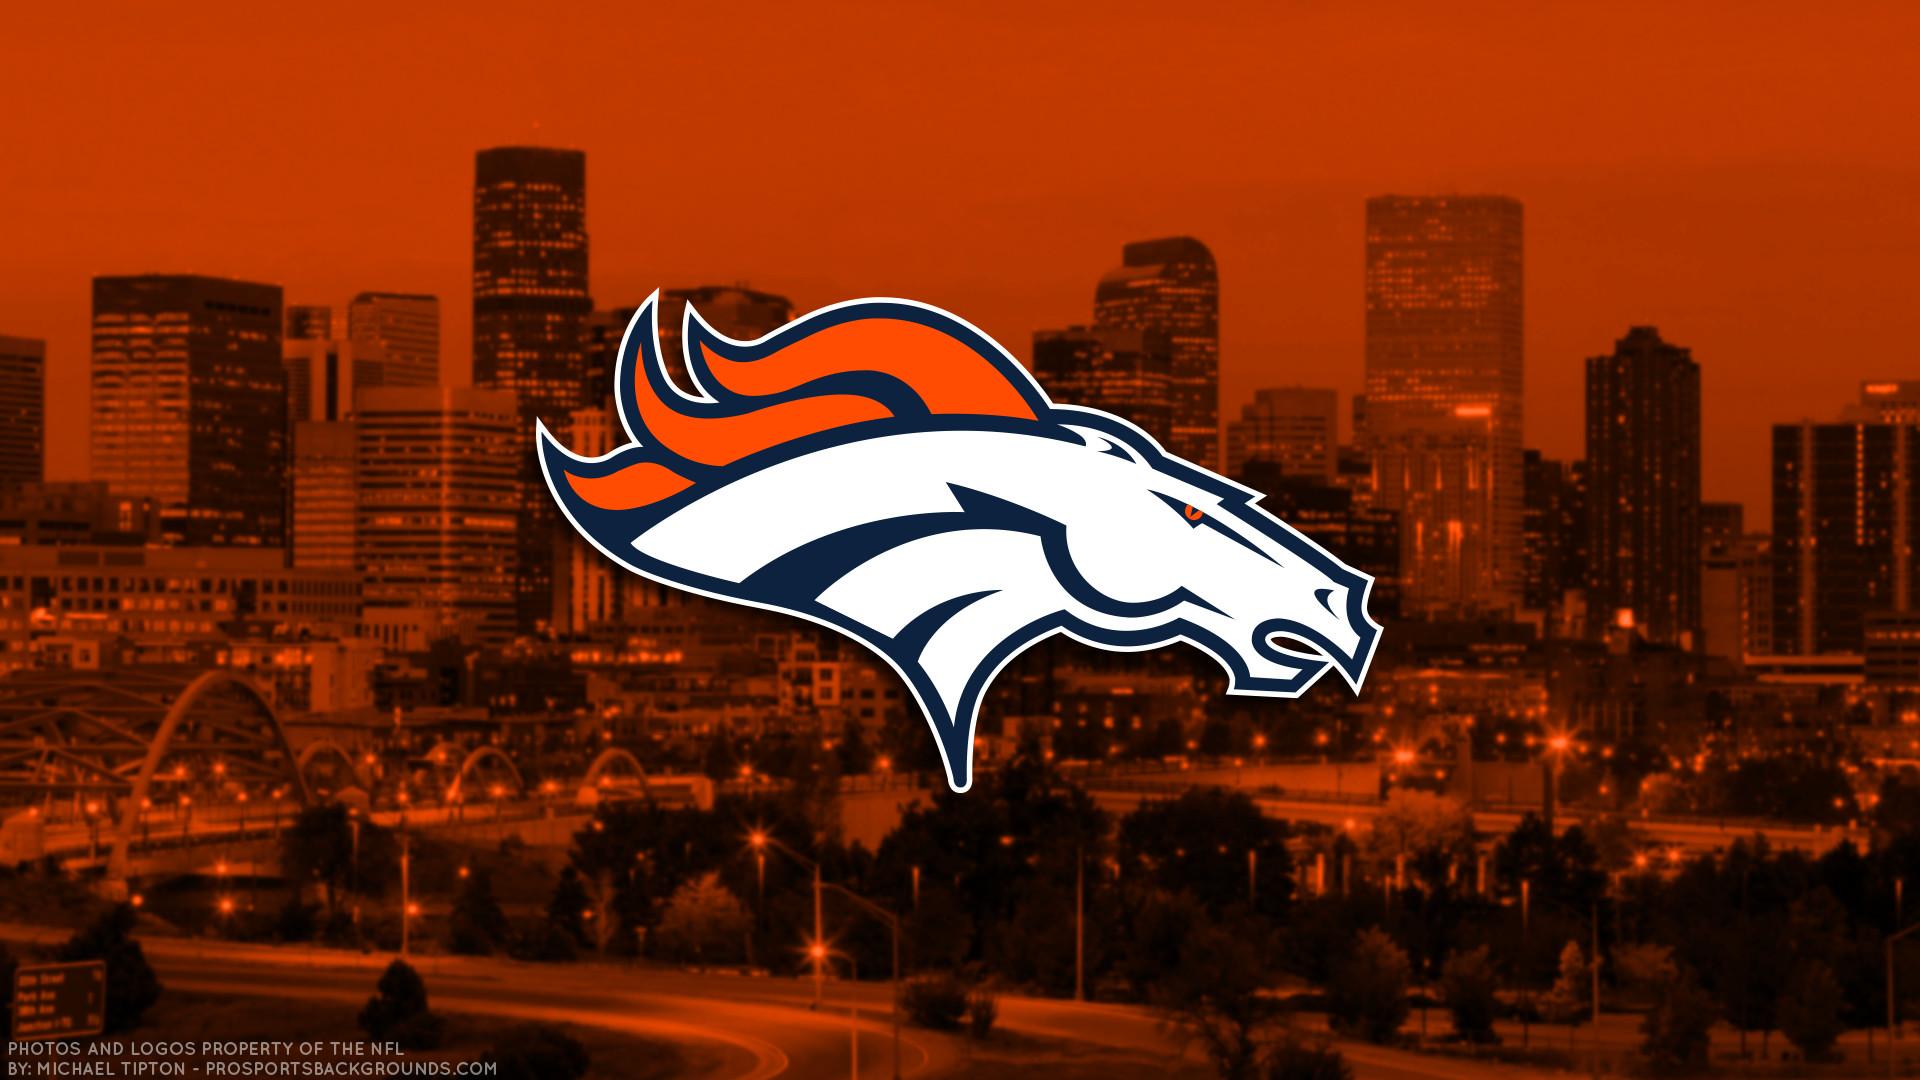 … Denver Broncos 2017 football logo wallpaper pc desktop computer